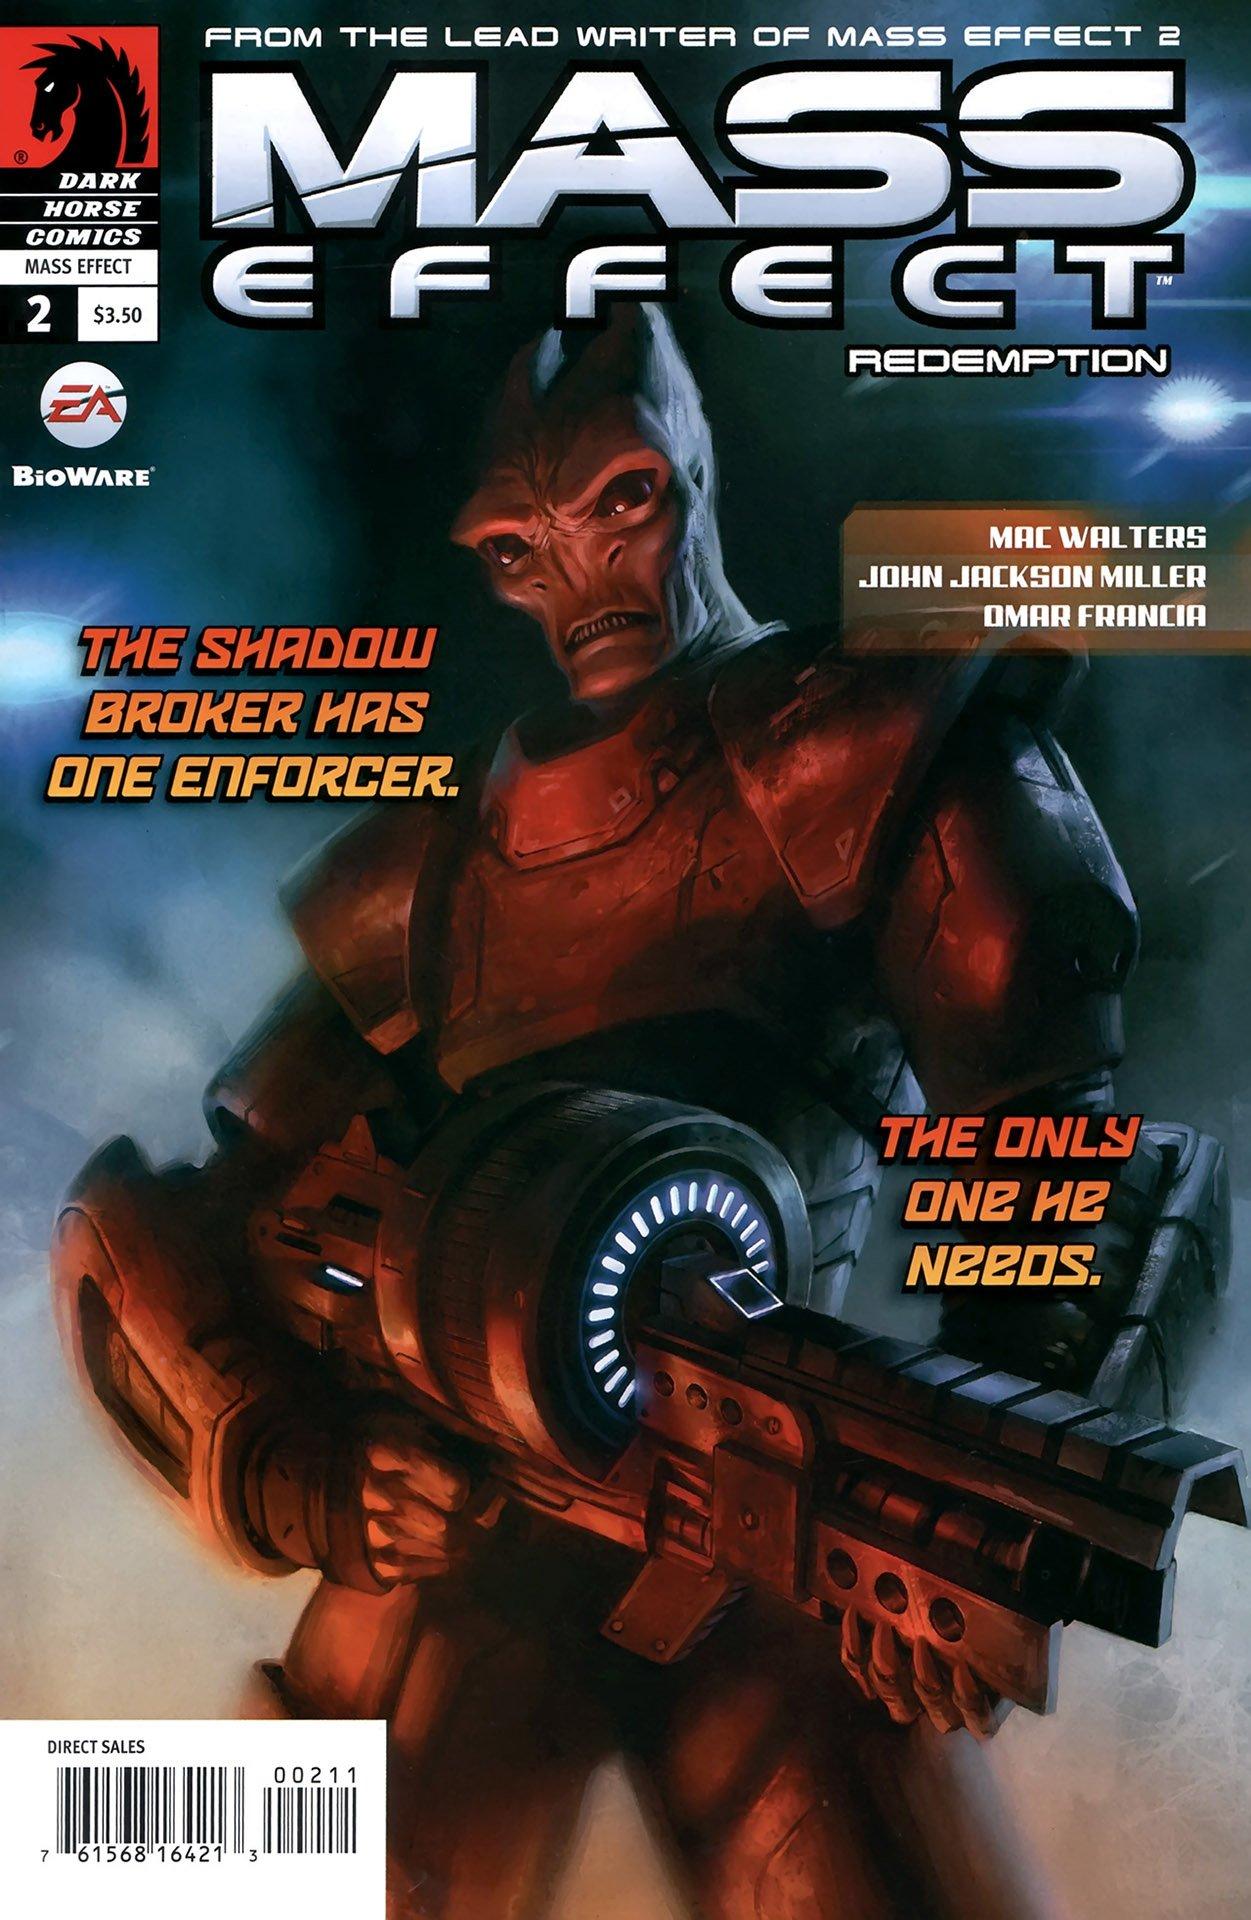 Mass Effect - Redemption 002 (February 2010)